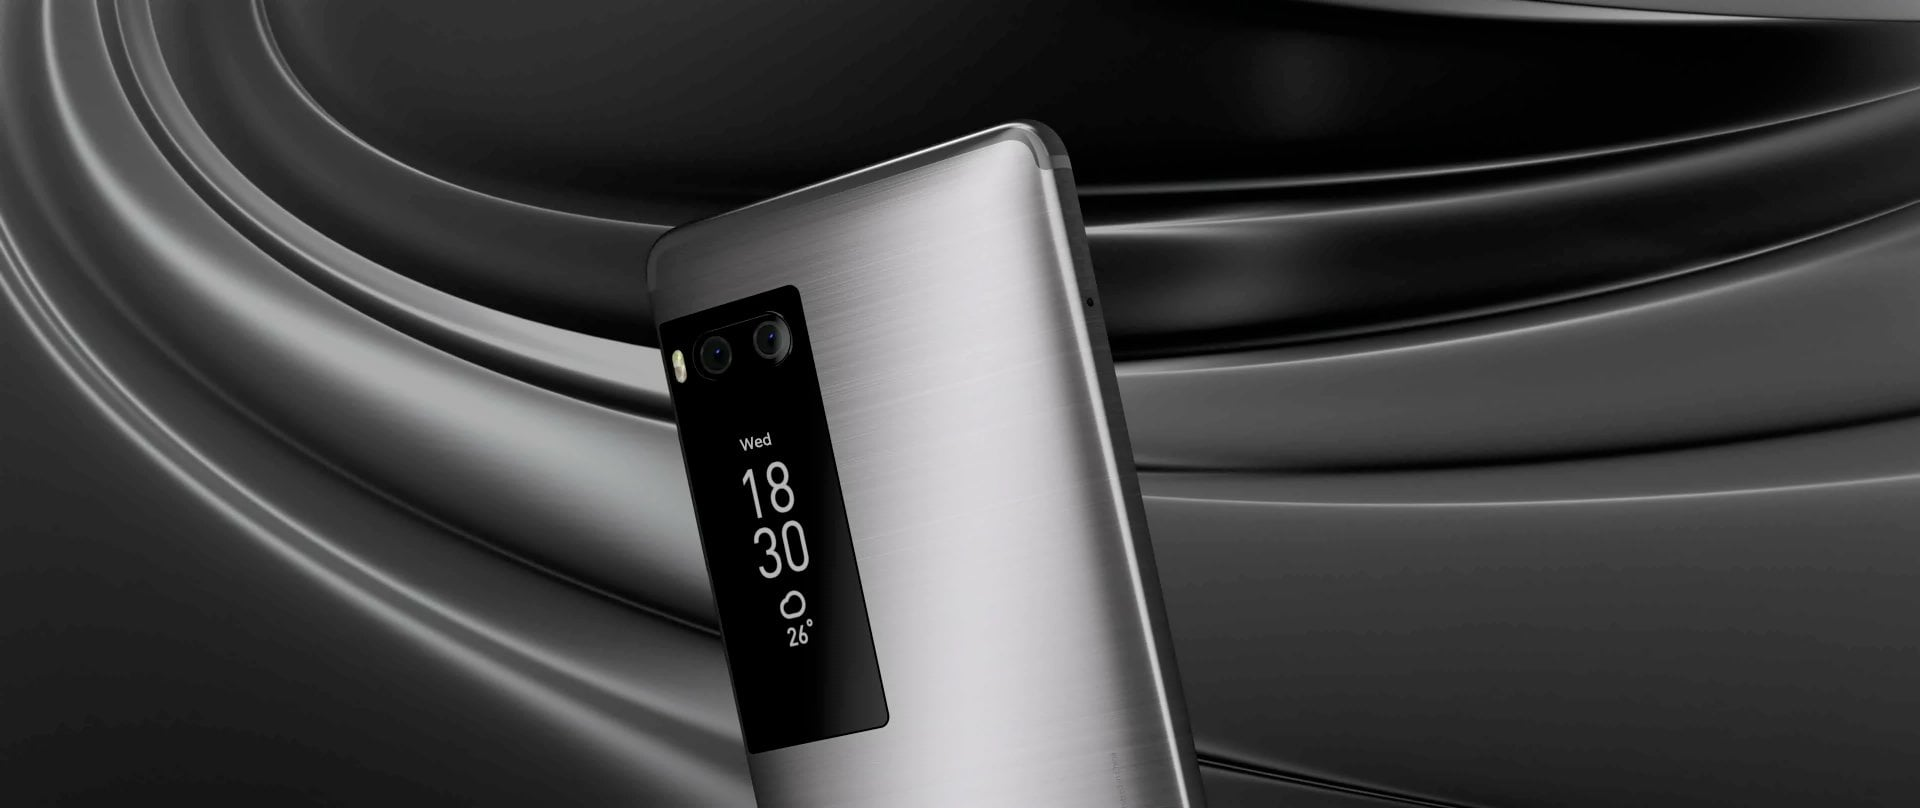 smartfon Meizu Pro 7 smartphone dodatkowy ekran